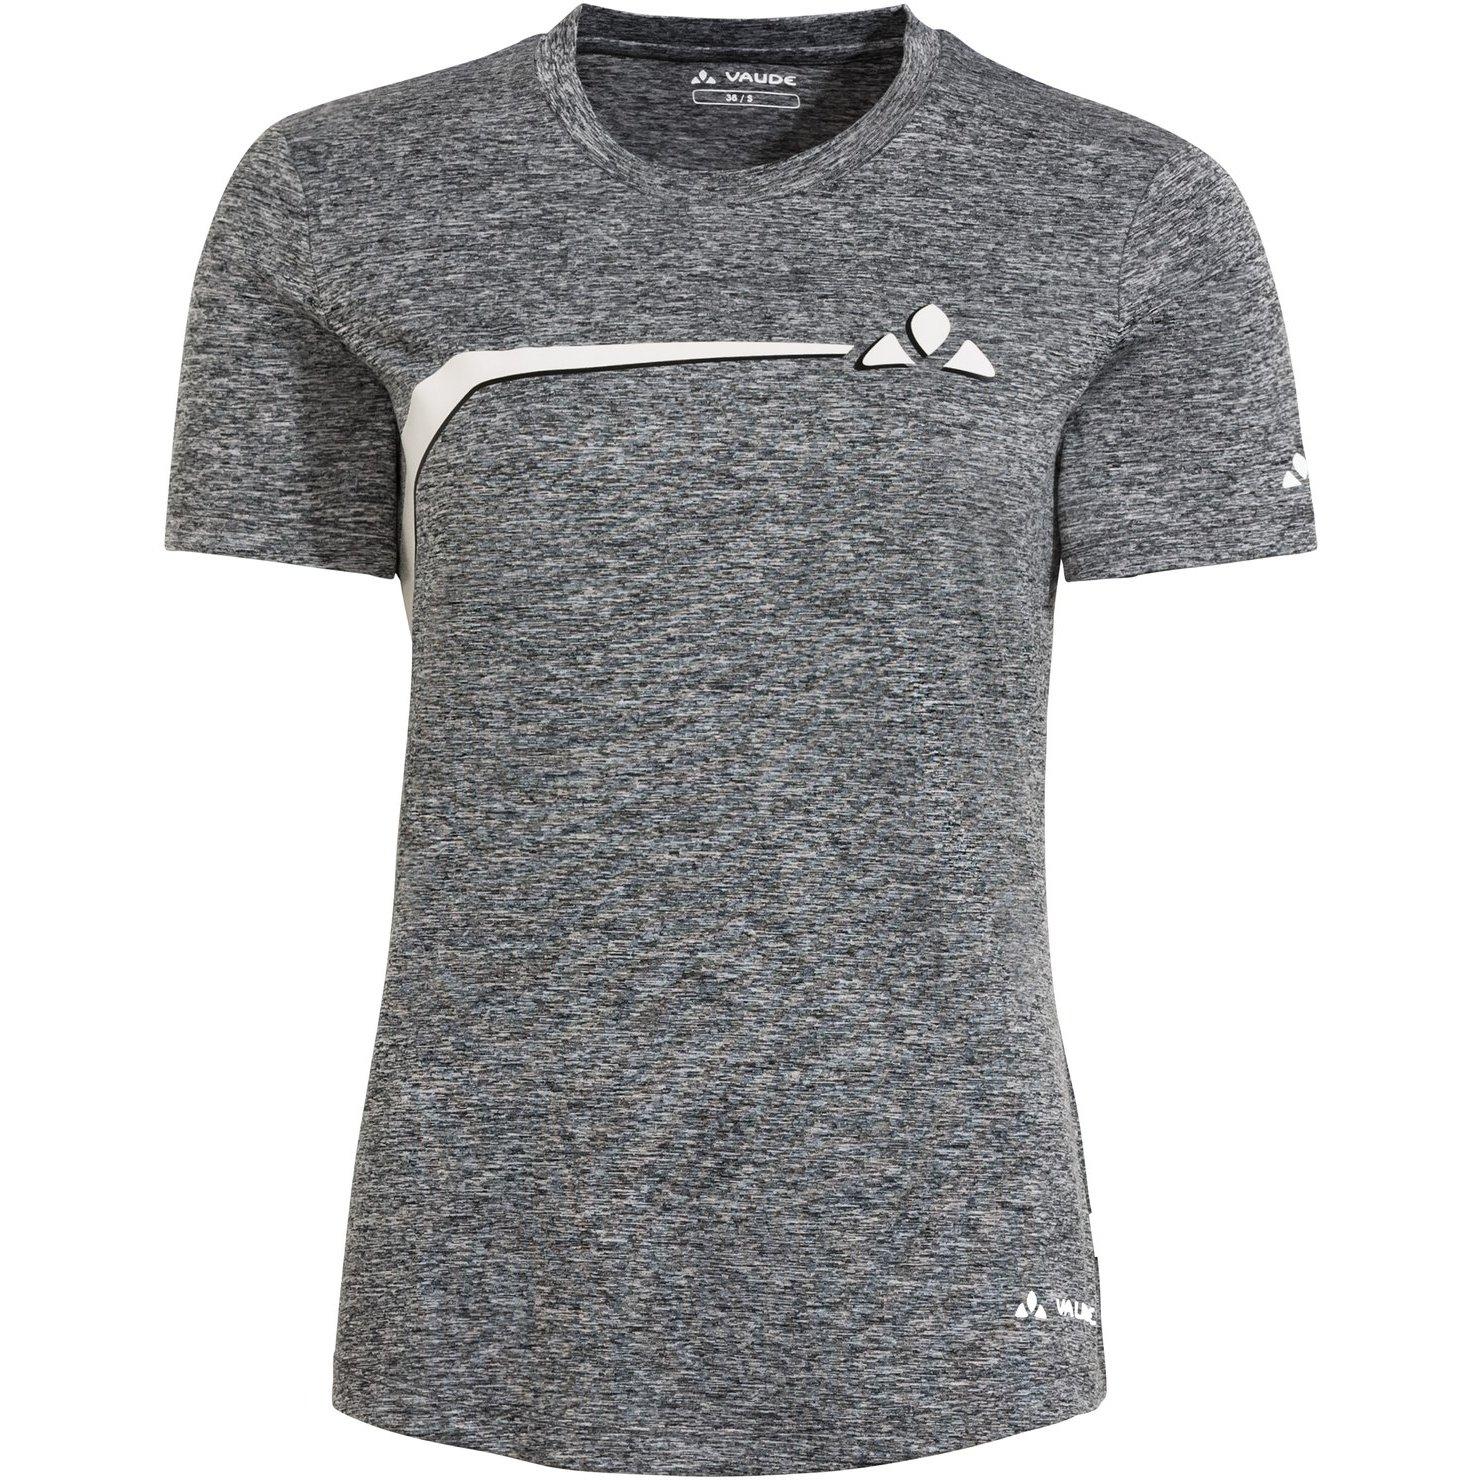 Vaude Bracket MTB Damen T-Shirt - black